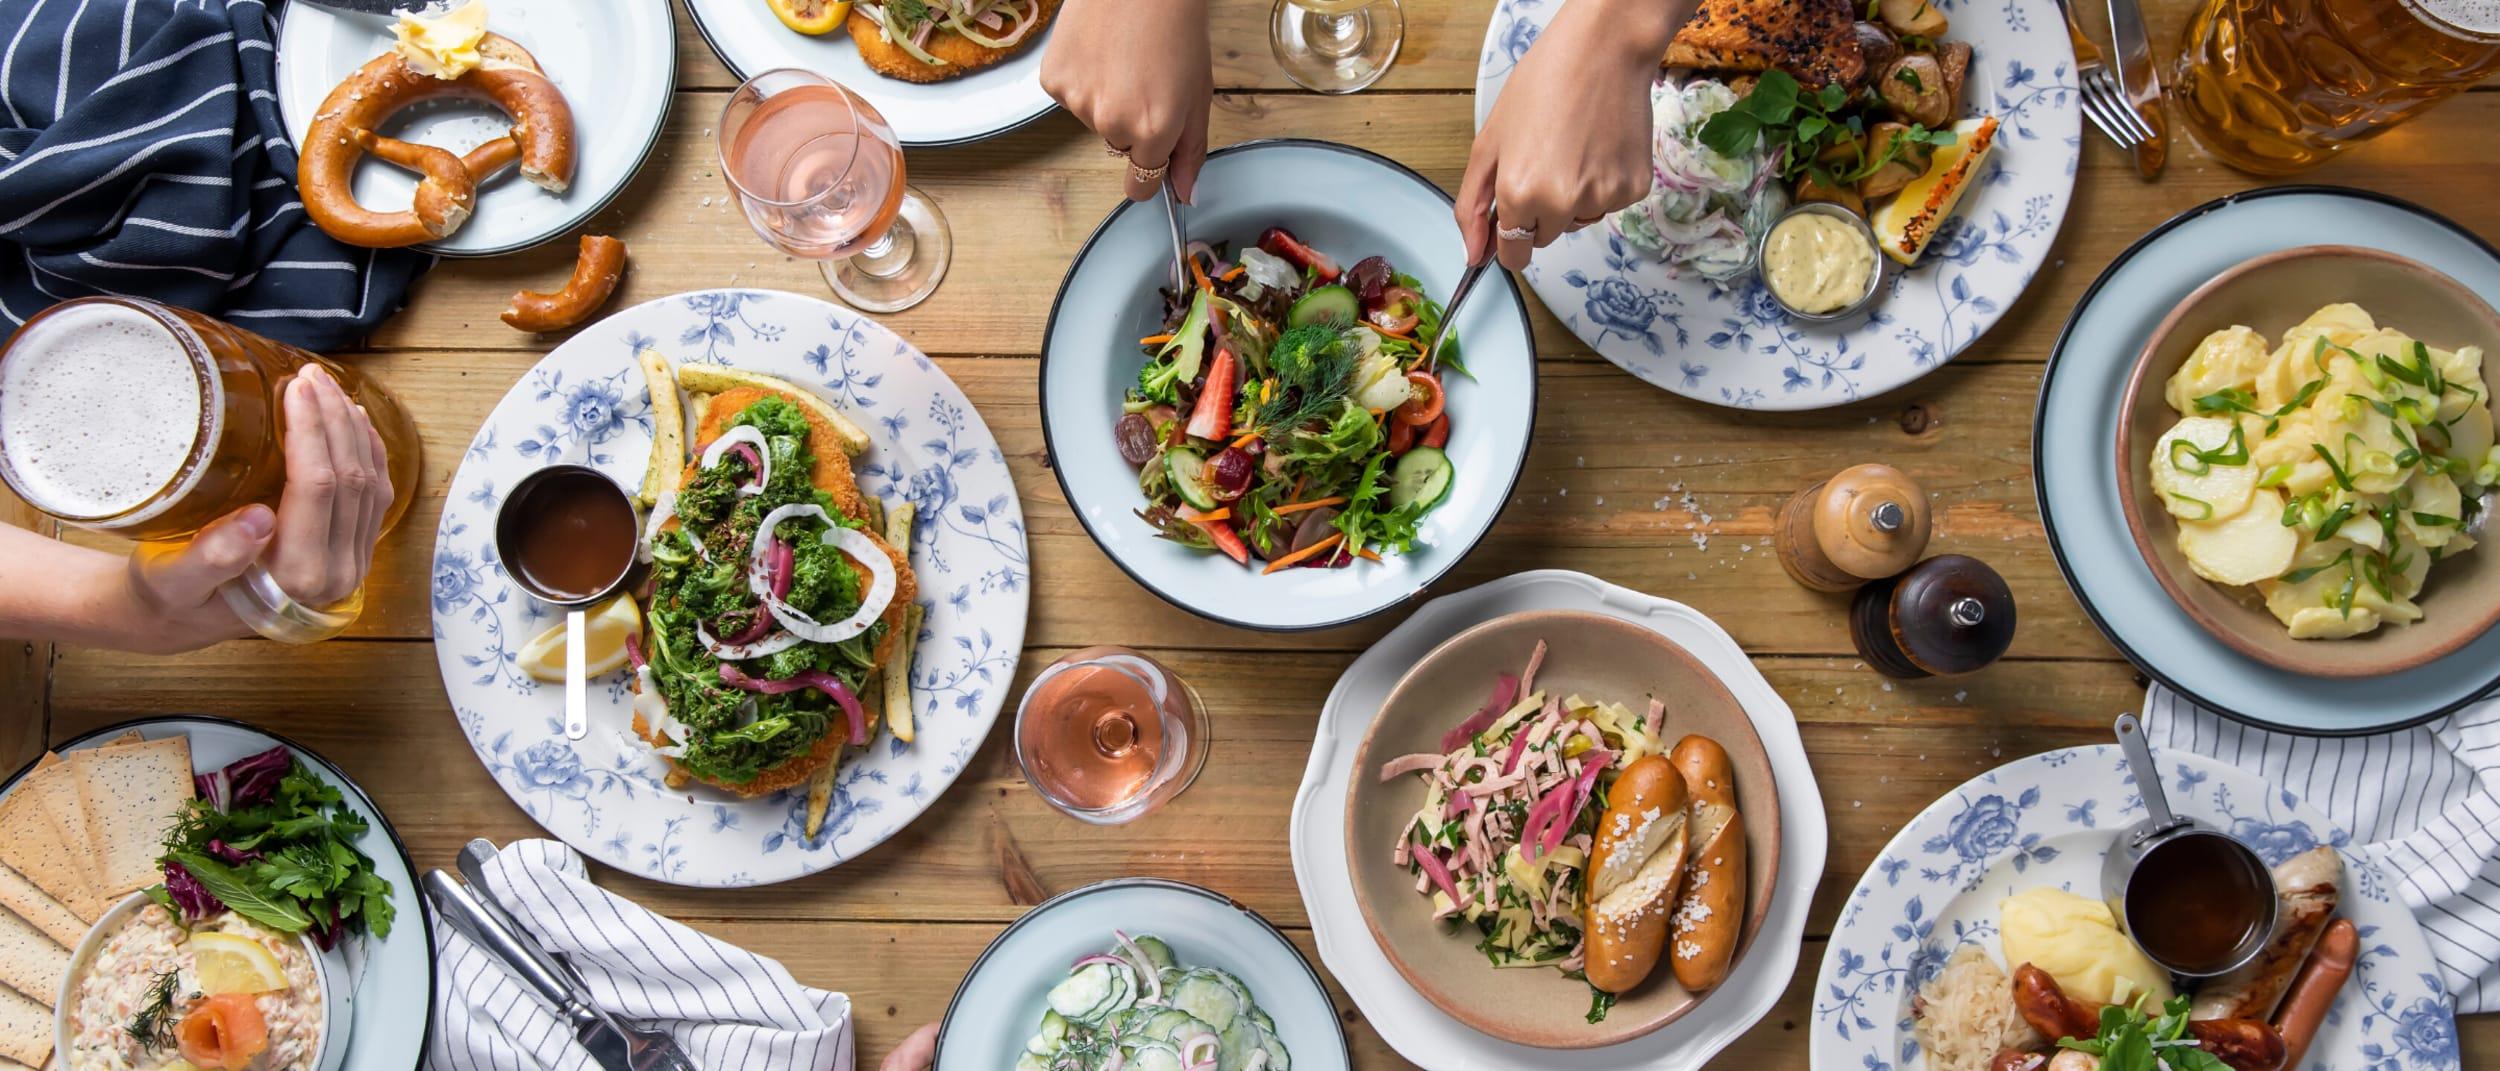 The Bavarian: New summer menu